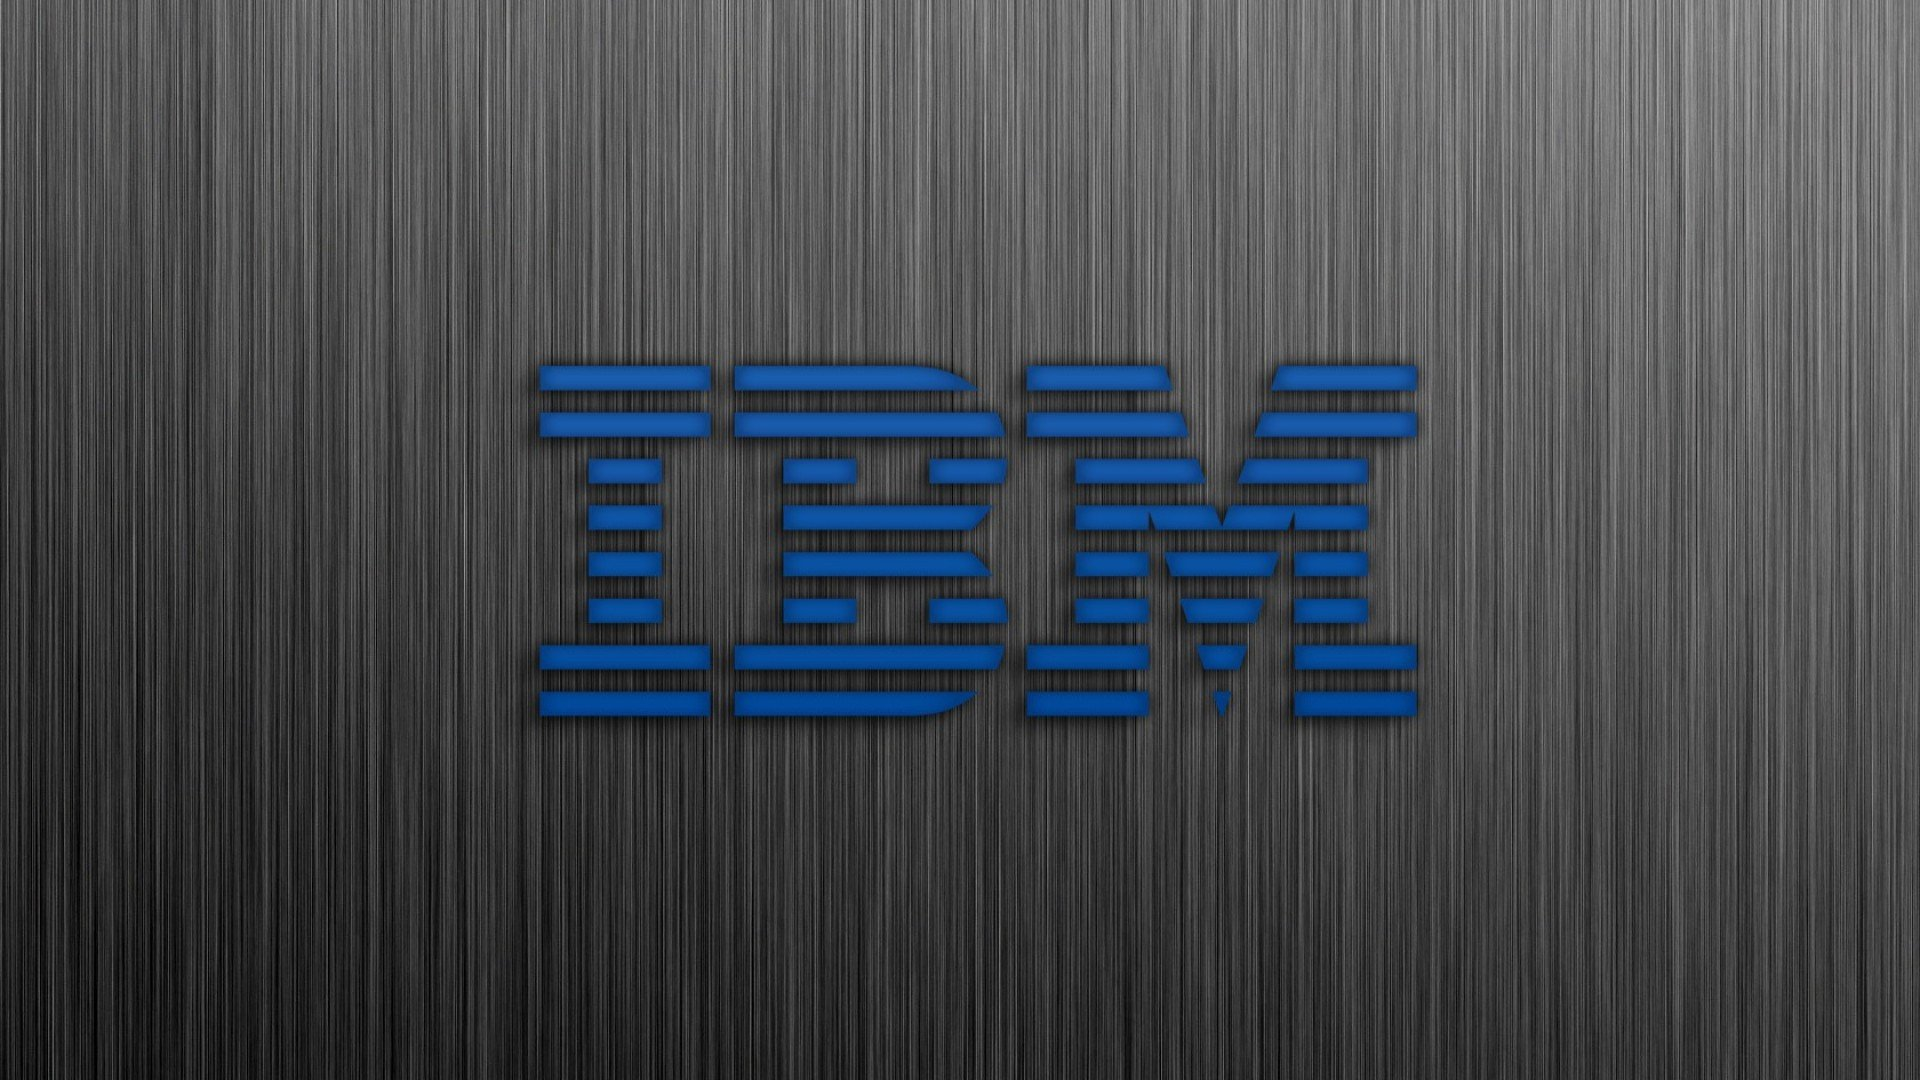 IBM Wallpaper 006 - 1920x1080